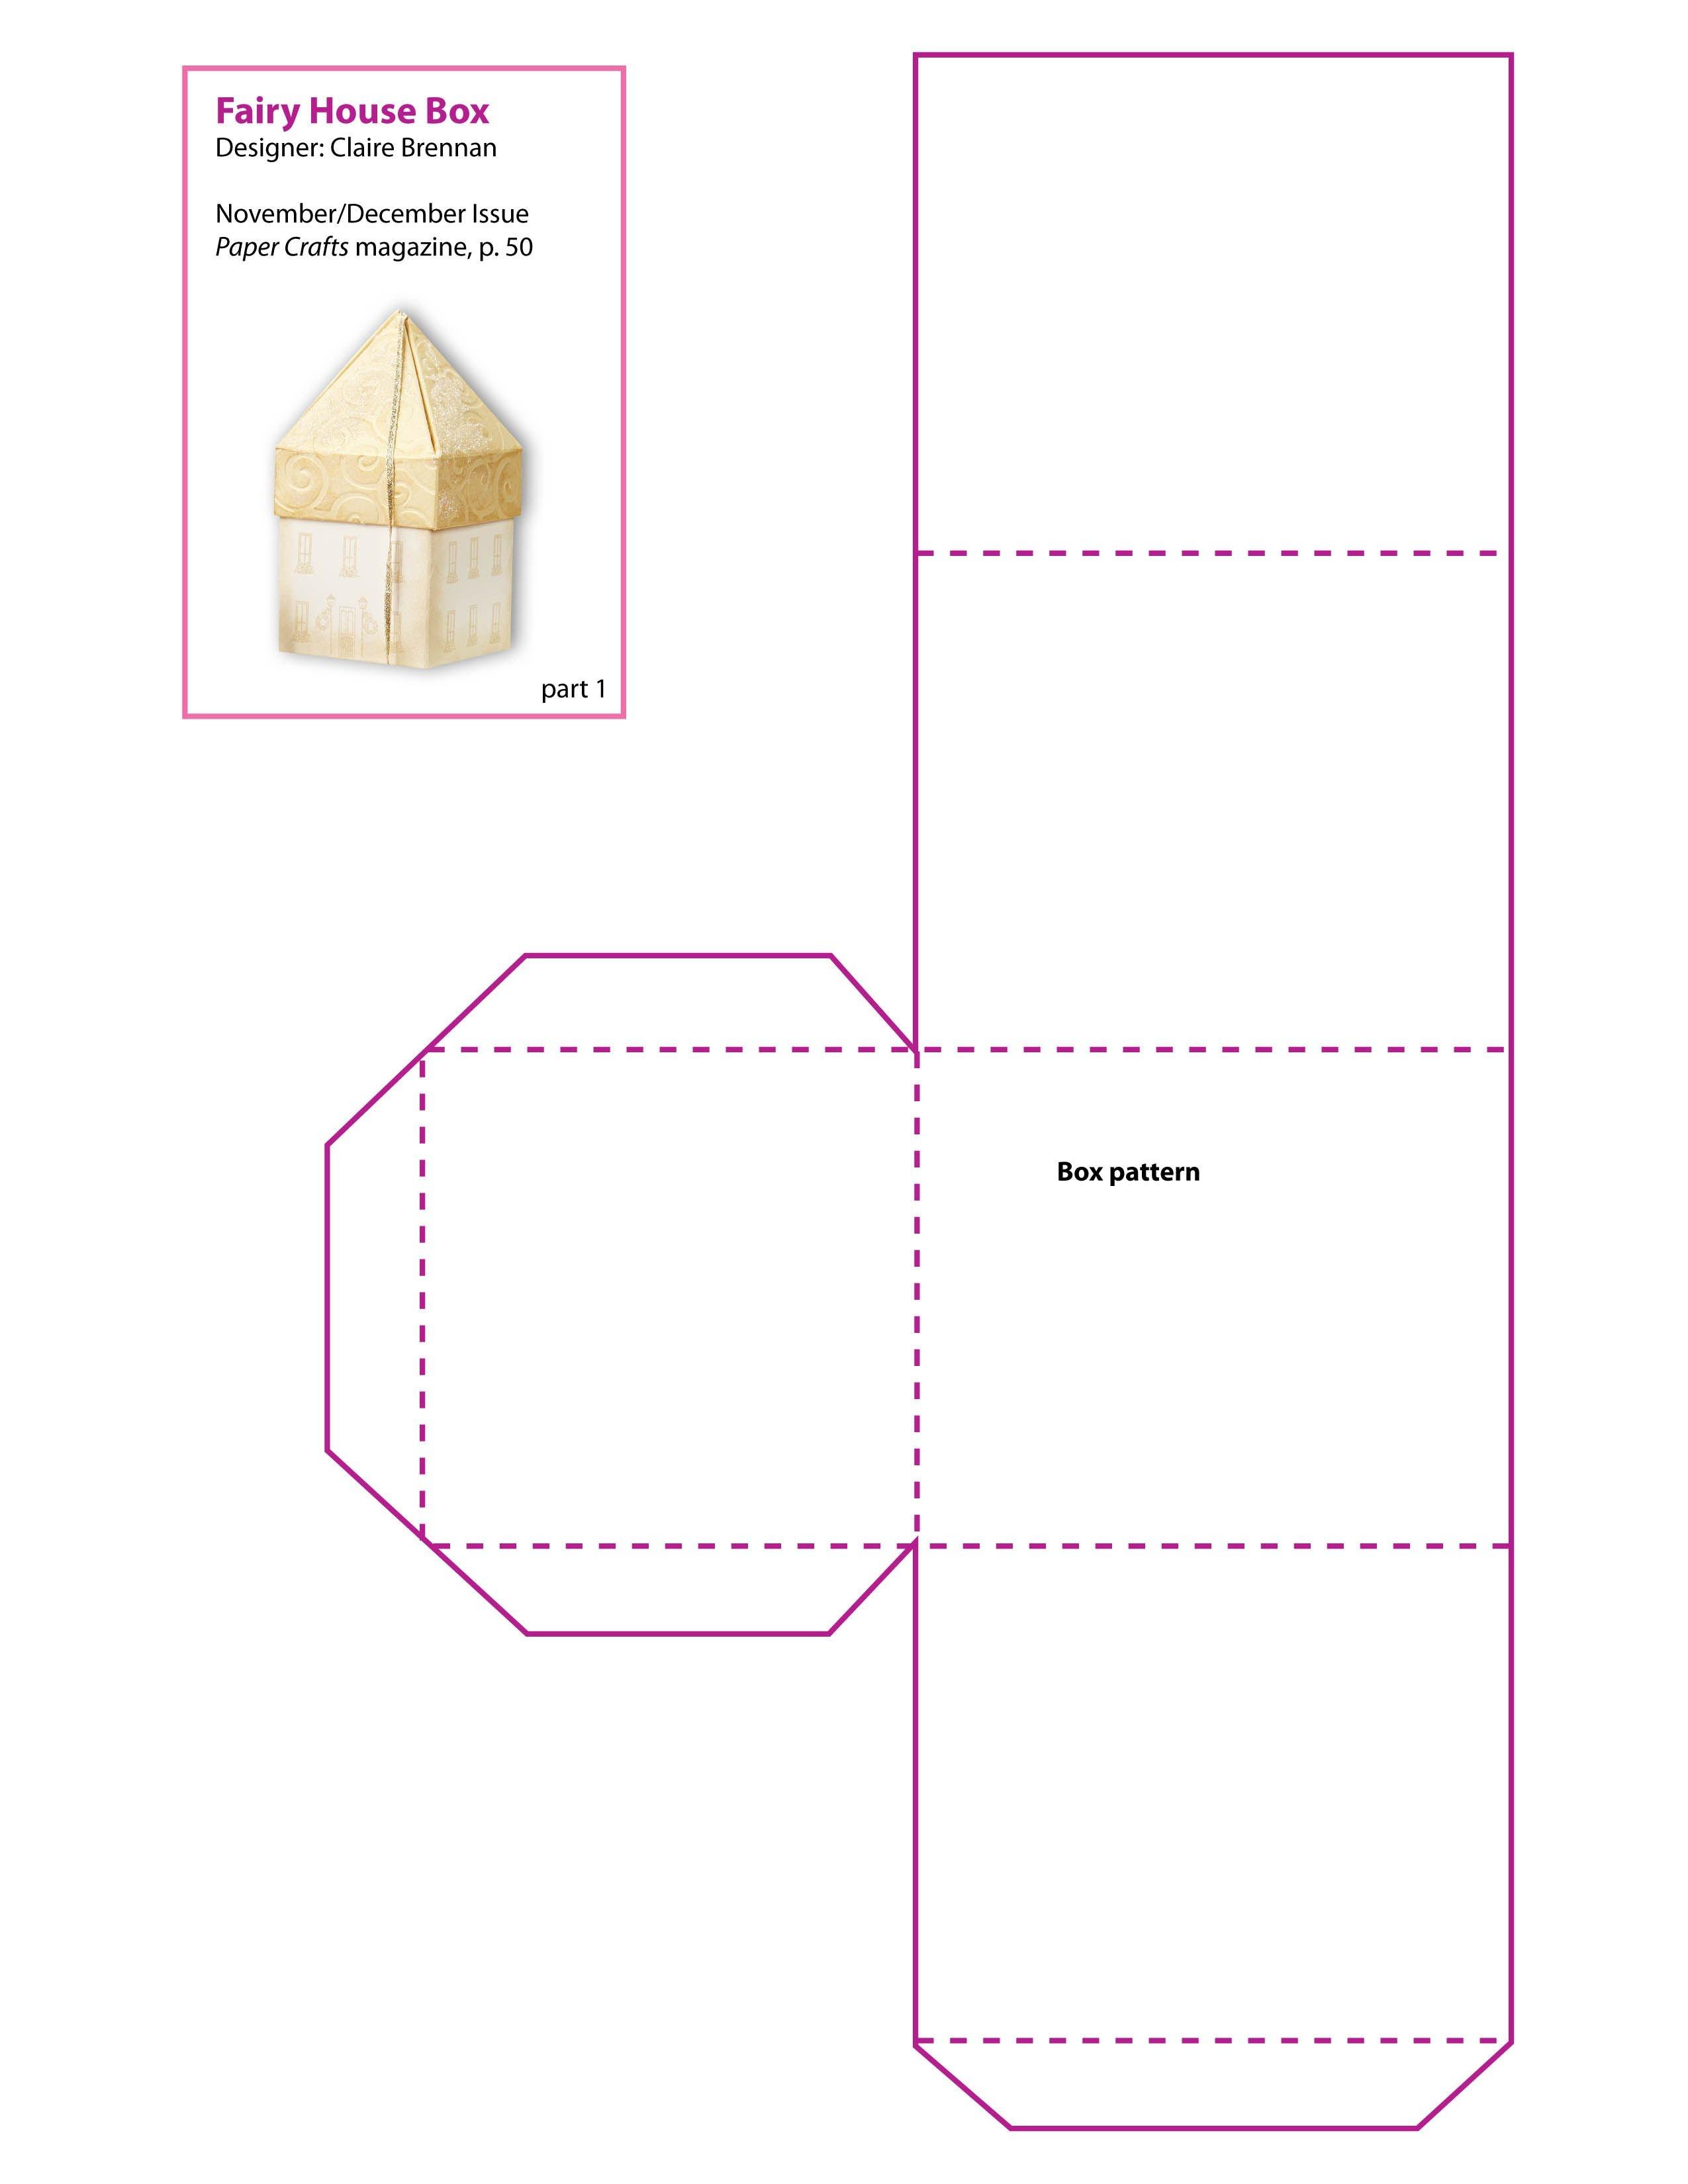 Free Printable Boxes Patterns | Free Printable Scrapbook Pages,print - Box Templates Free Printable